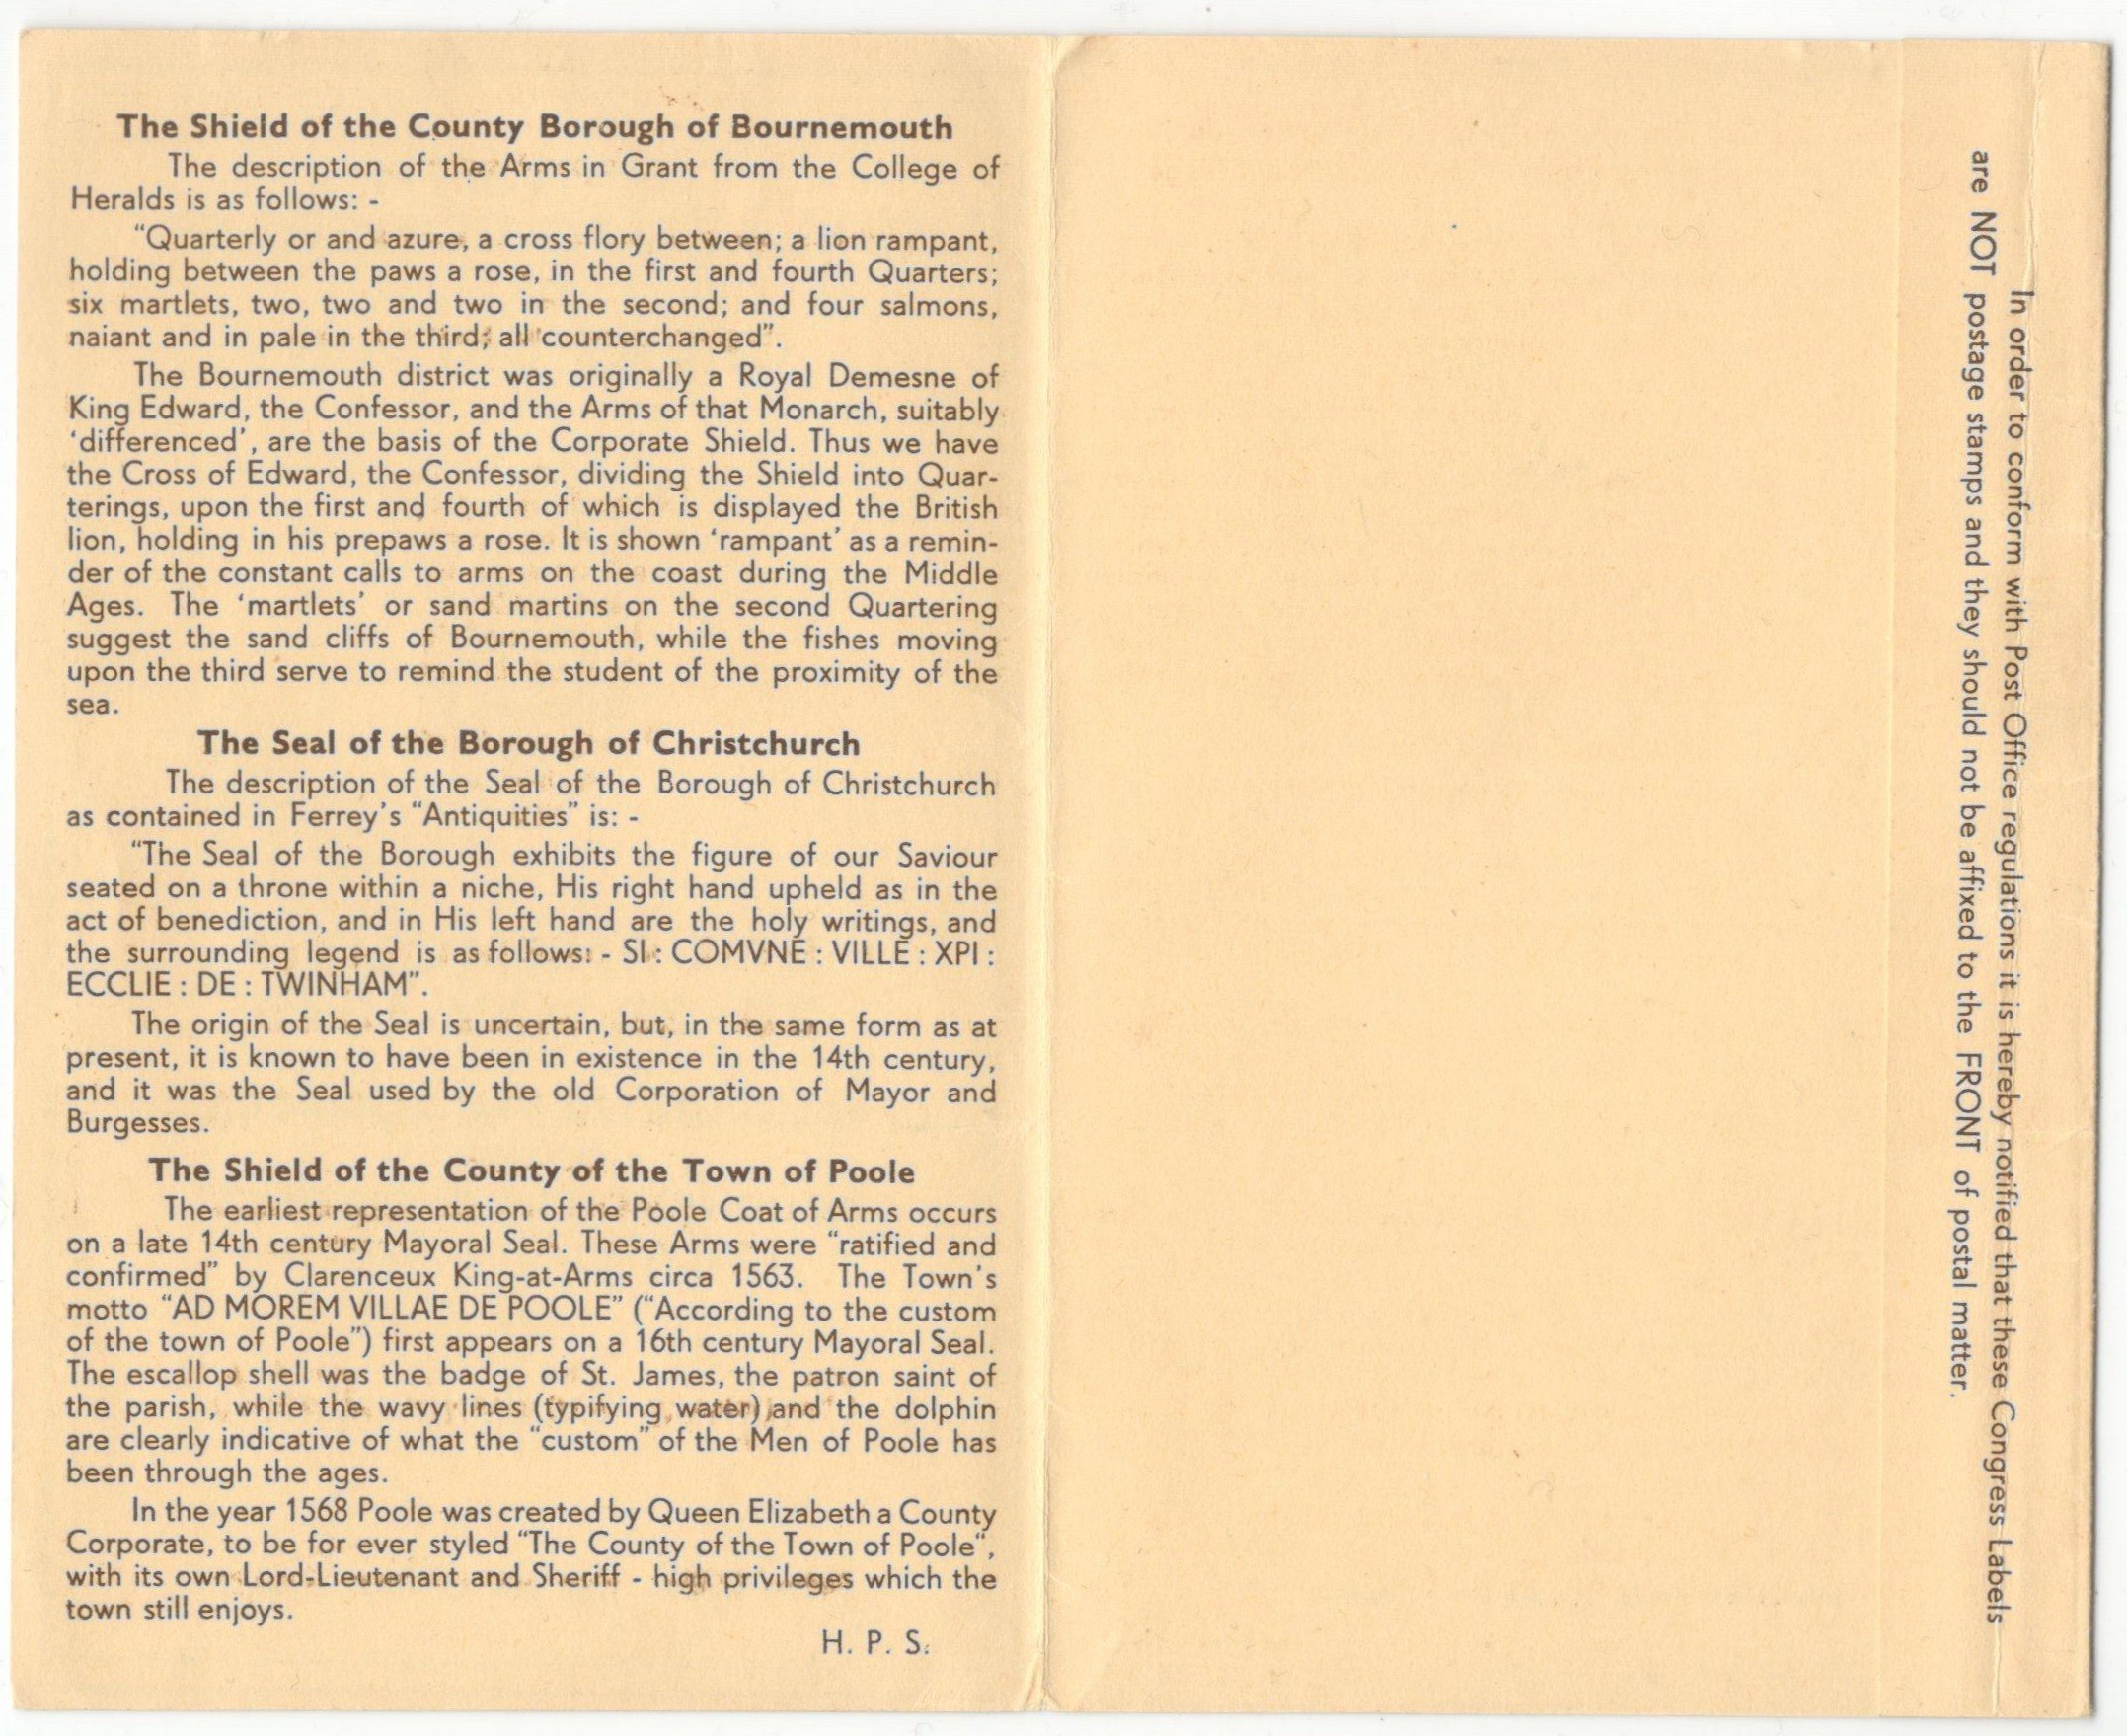 Lot 4 - 1948 BOURNEMOUTH Philatelic Congress of GB - Congress Souvenir Labels